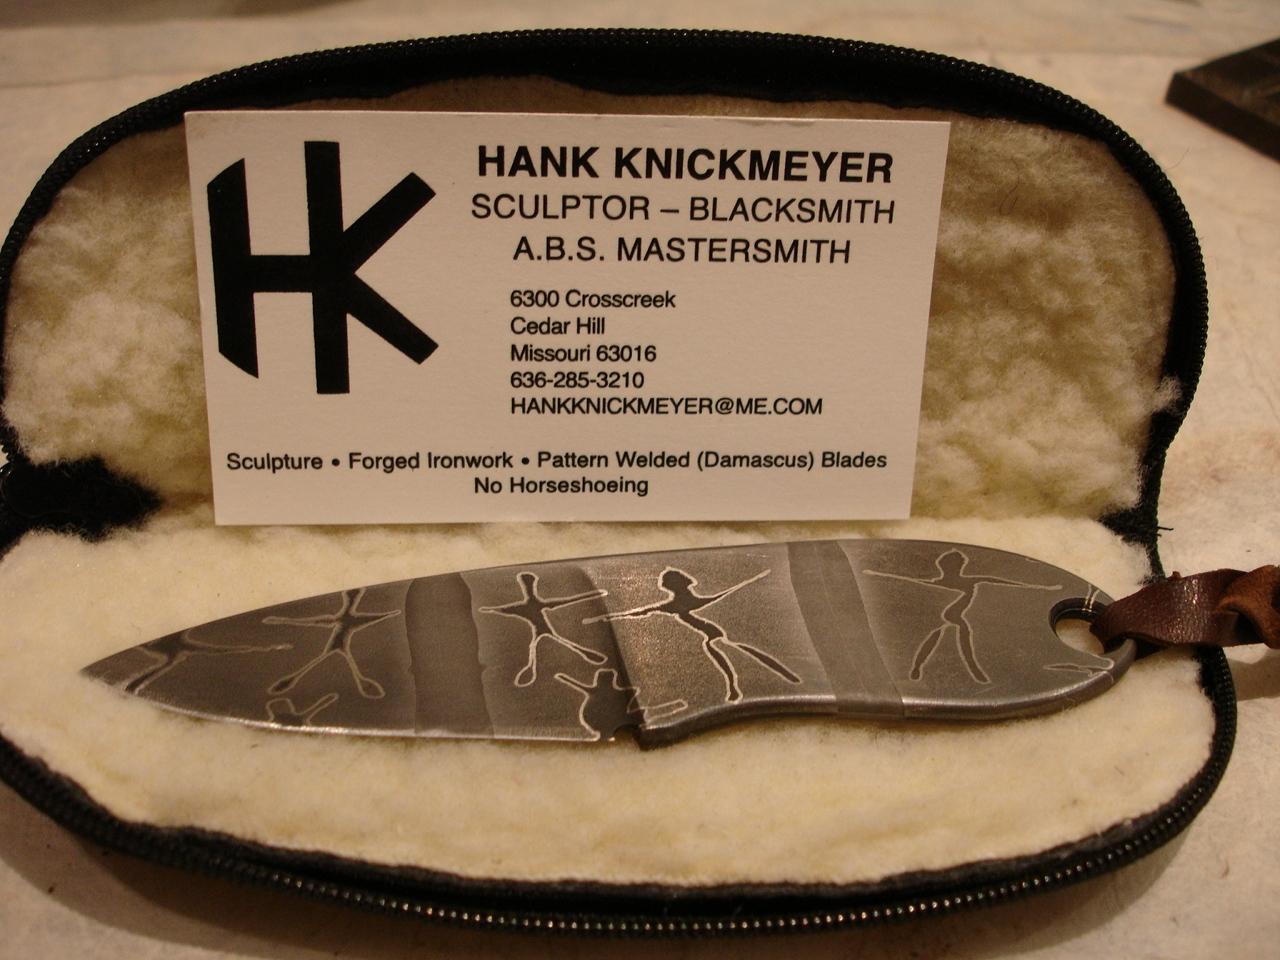 hank knickmeyer